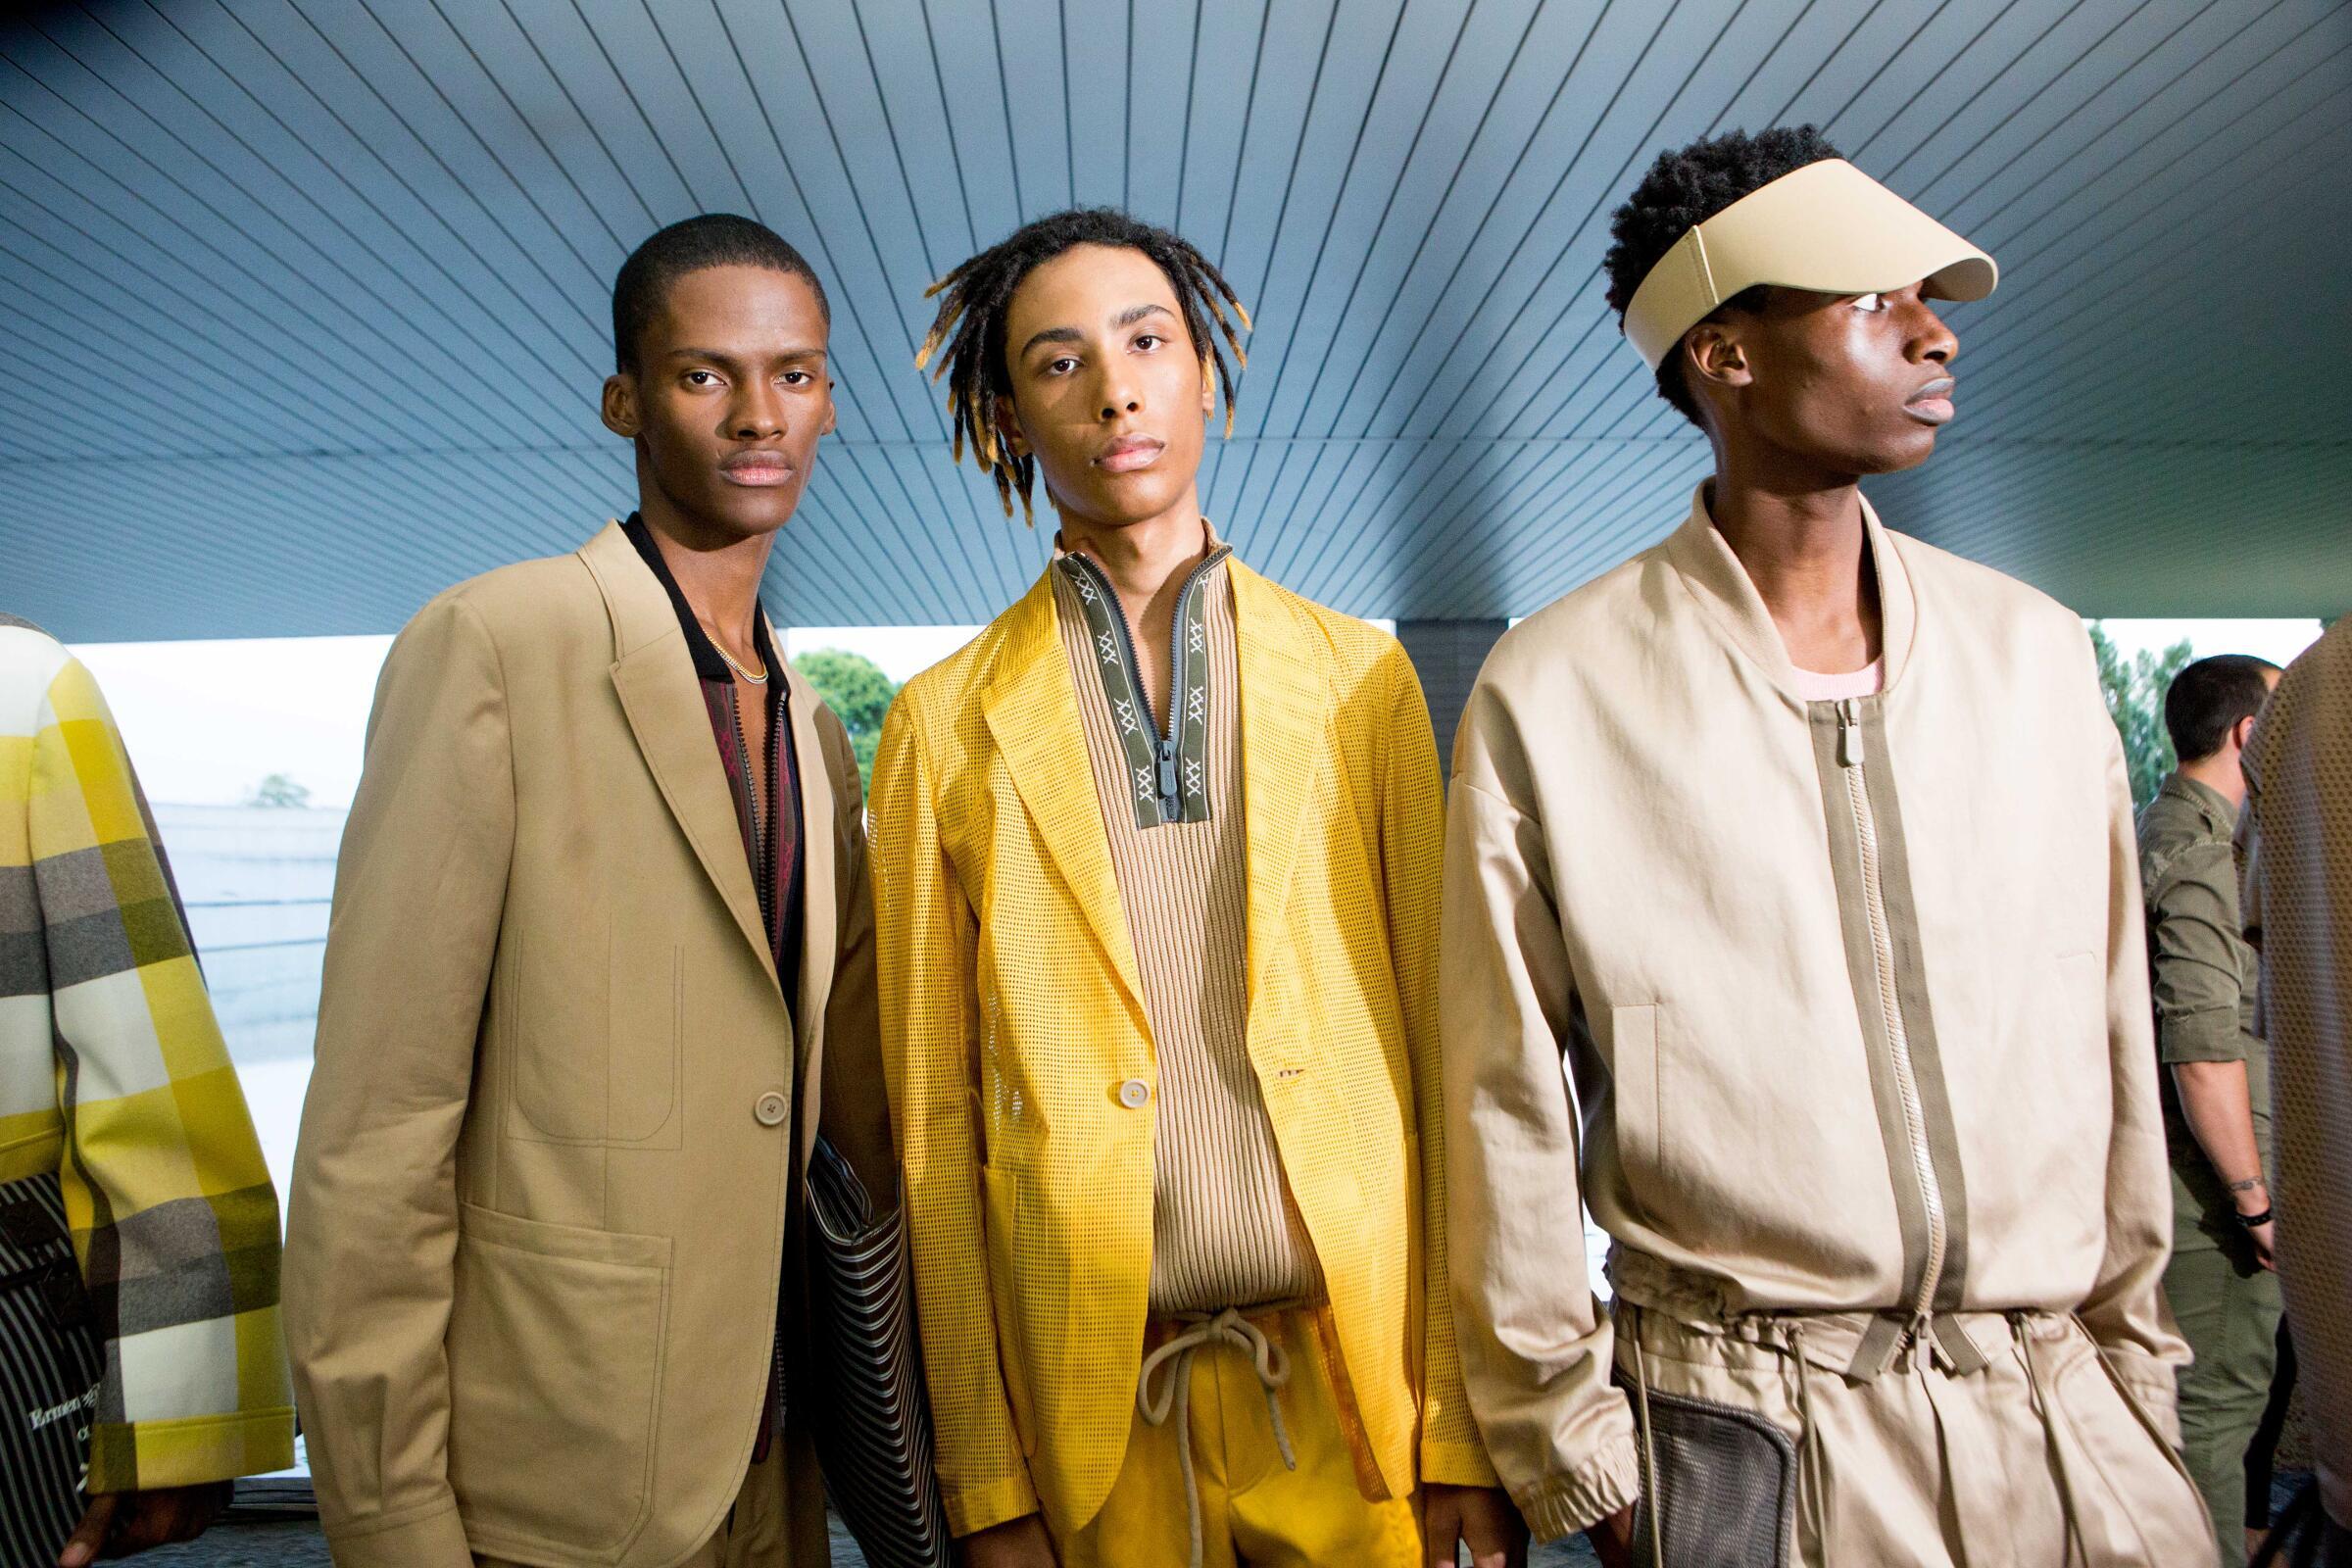 Backstage Ermenegildo Zegna Couture Models Menswear